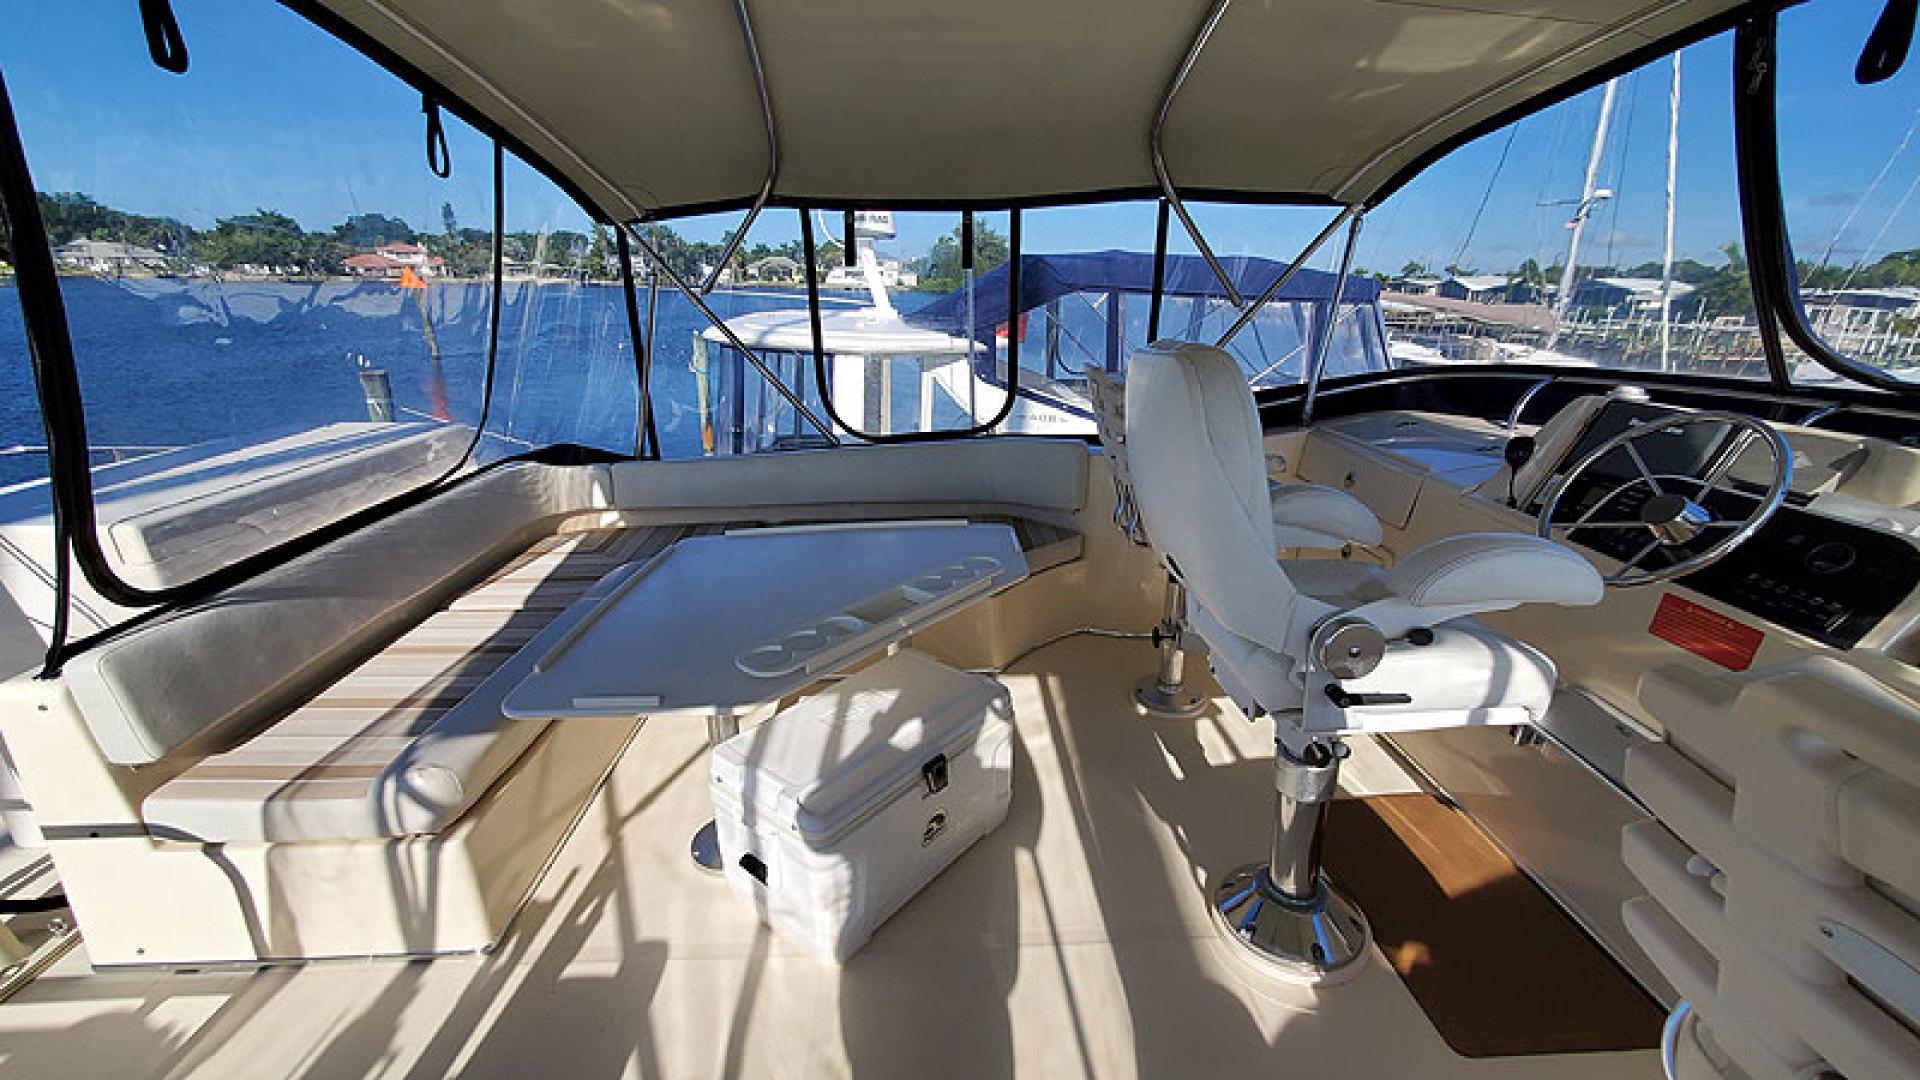 Mainship-430 Sedan 2006-Windy Cove II Venice-Florida-United States-1266392 | Thumbnail